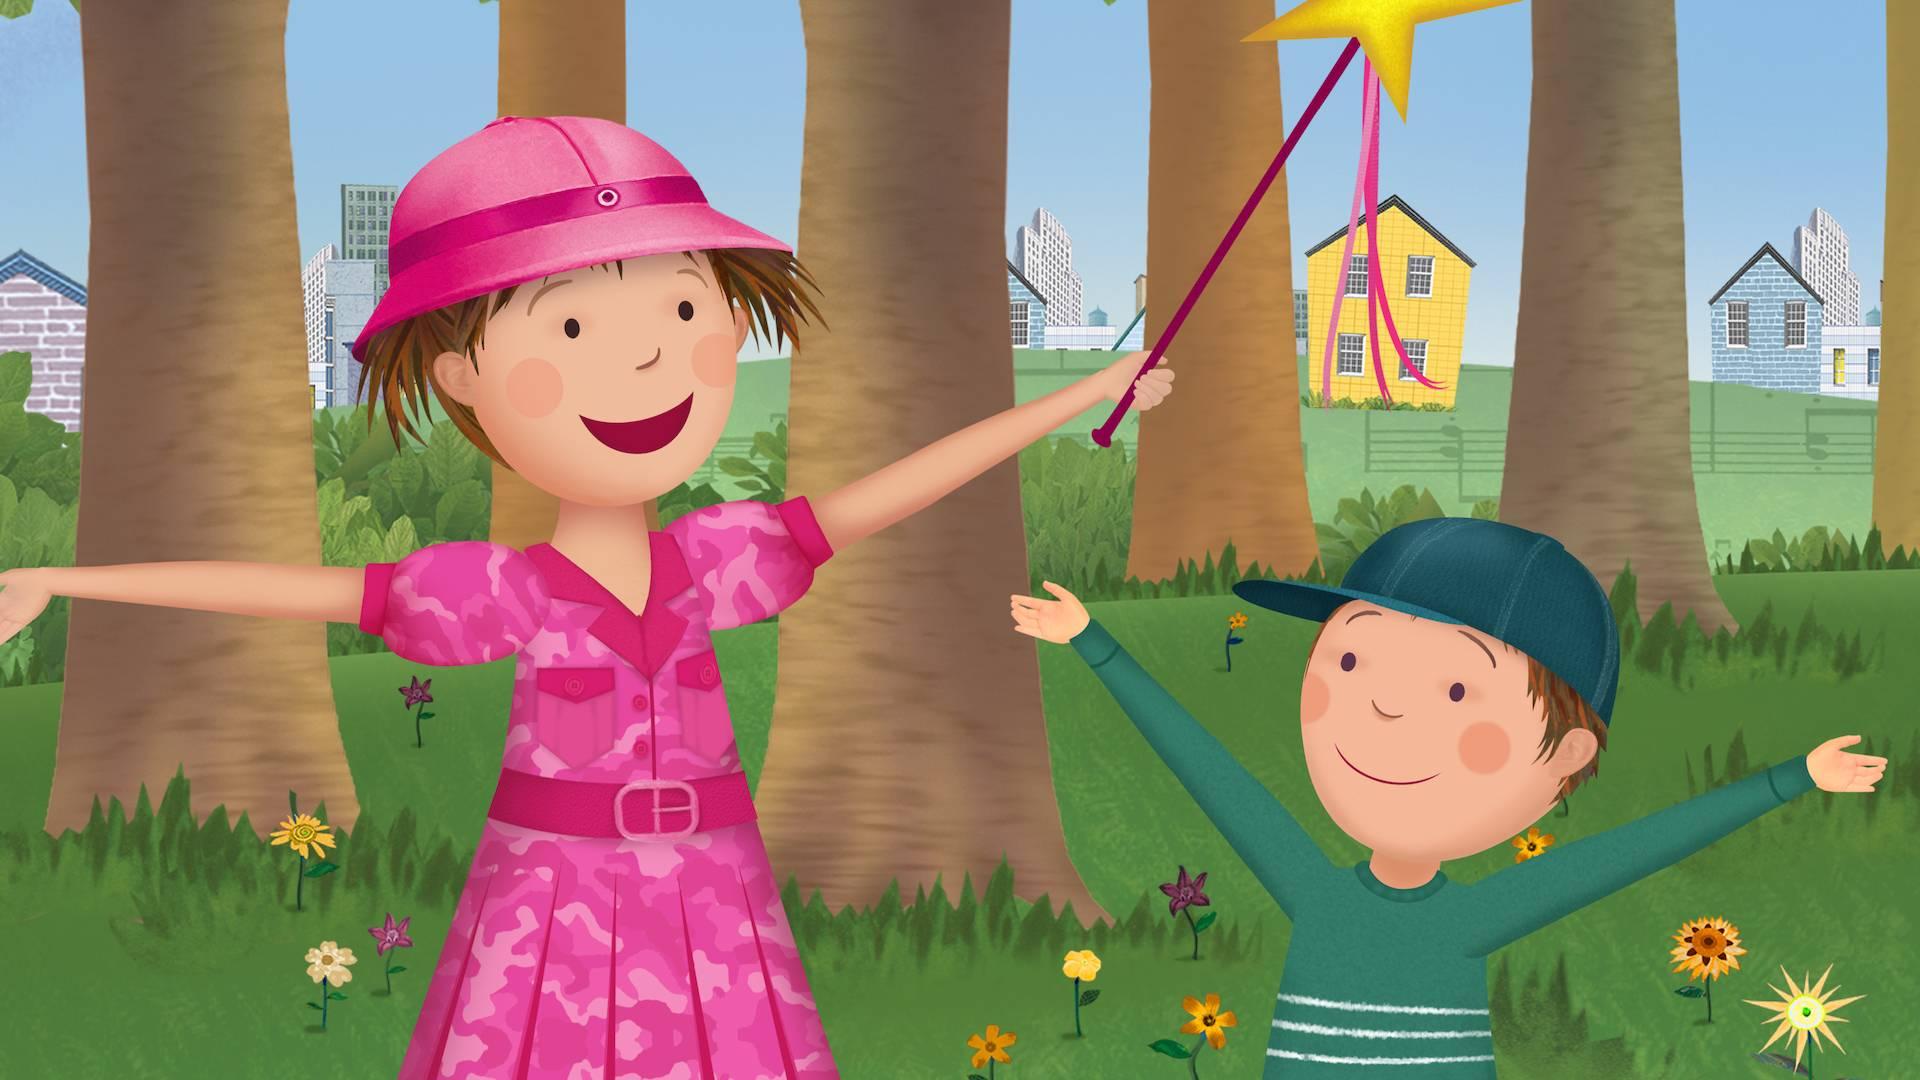 pbs kids announces new series pinkalicious peterrific premiering